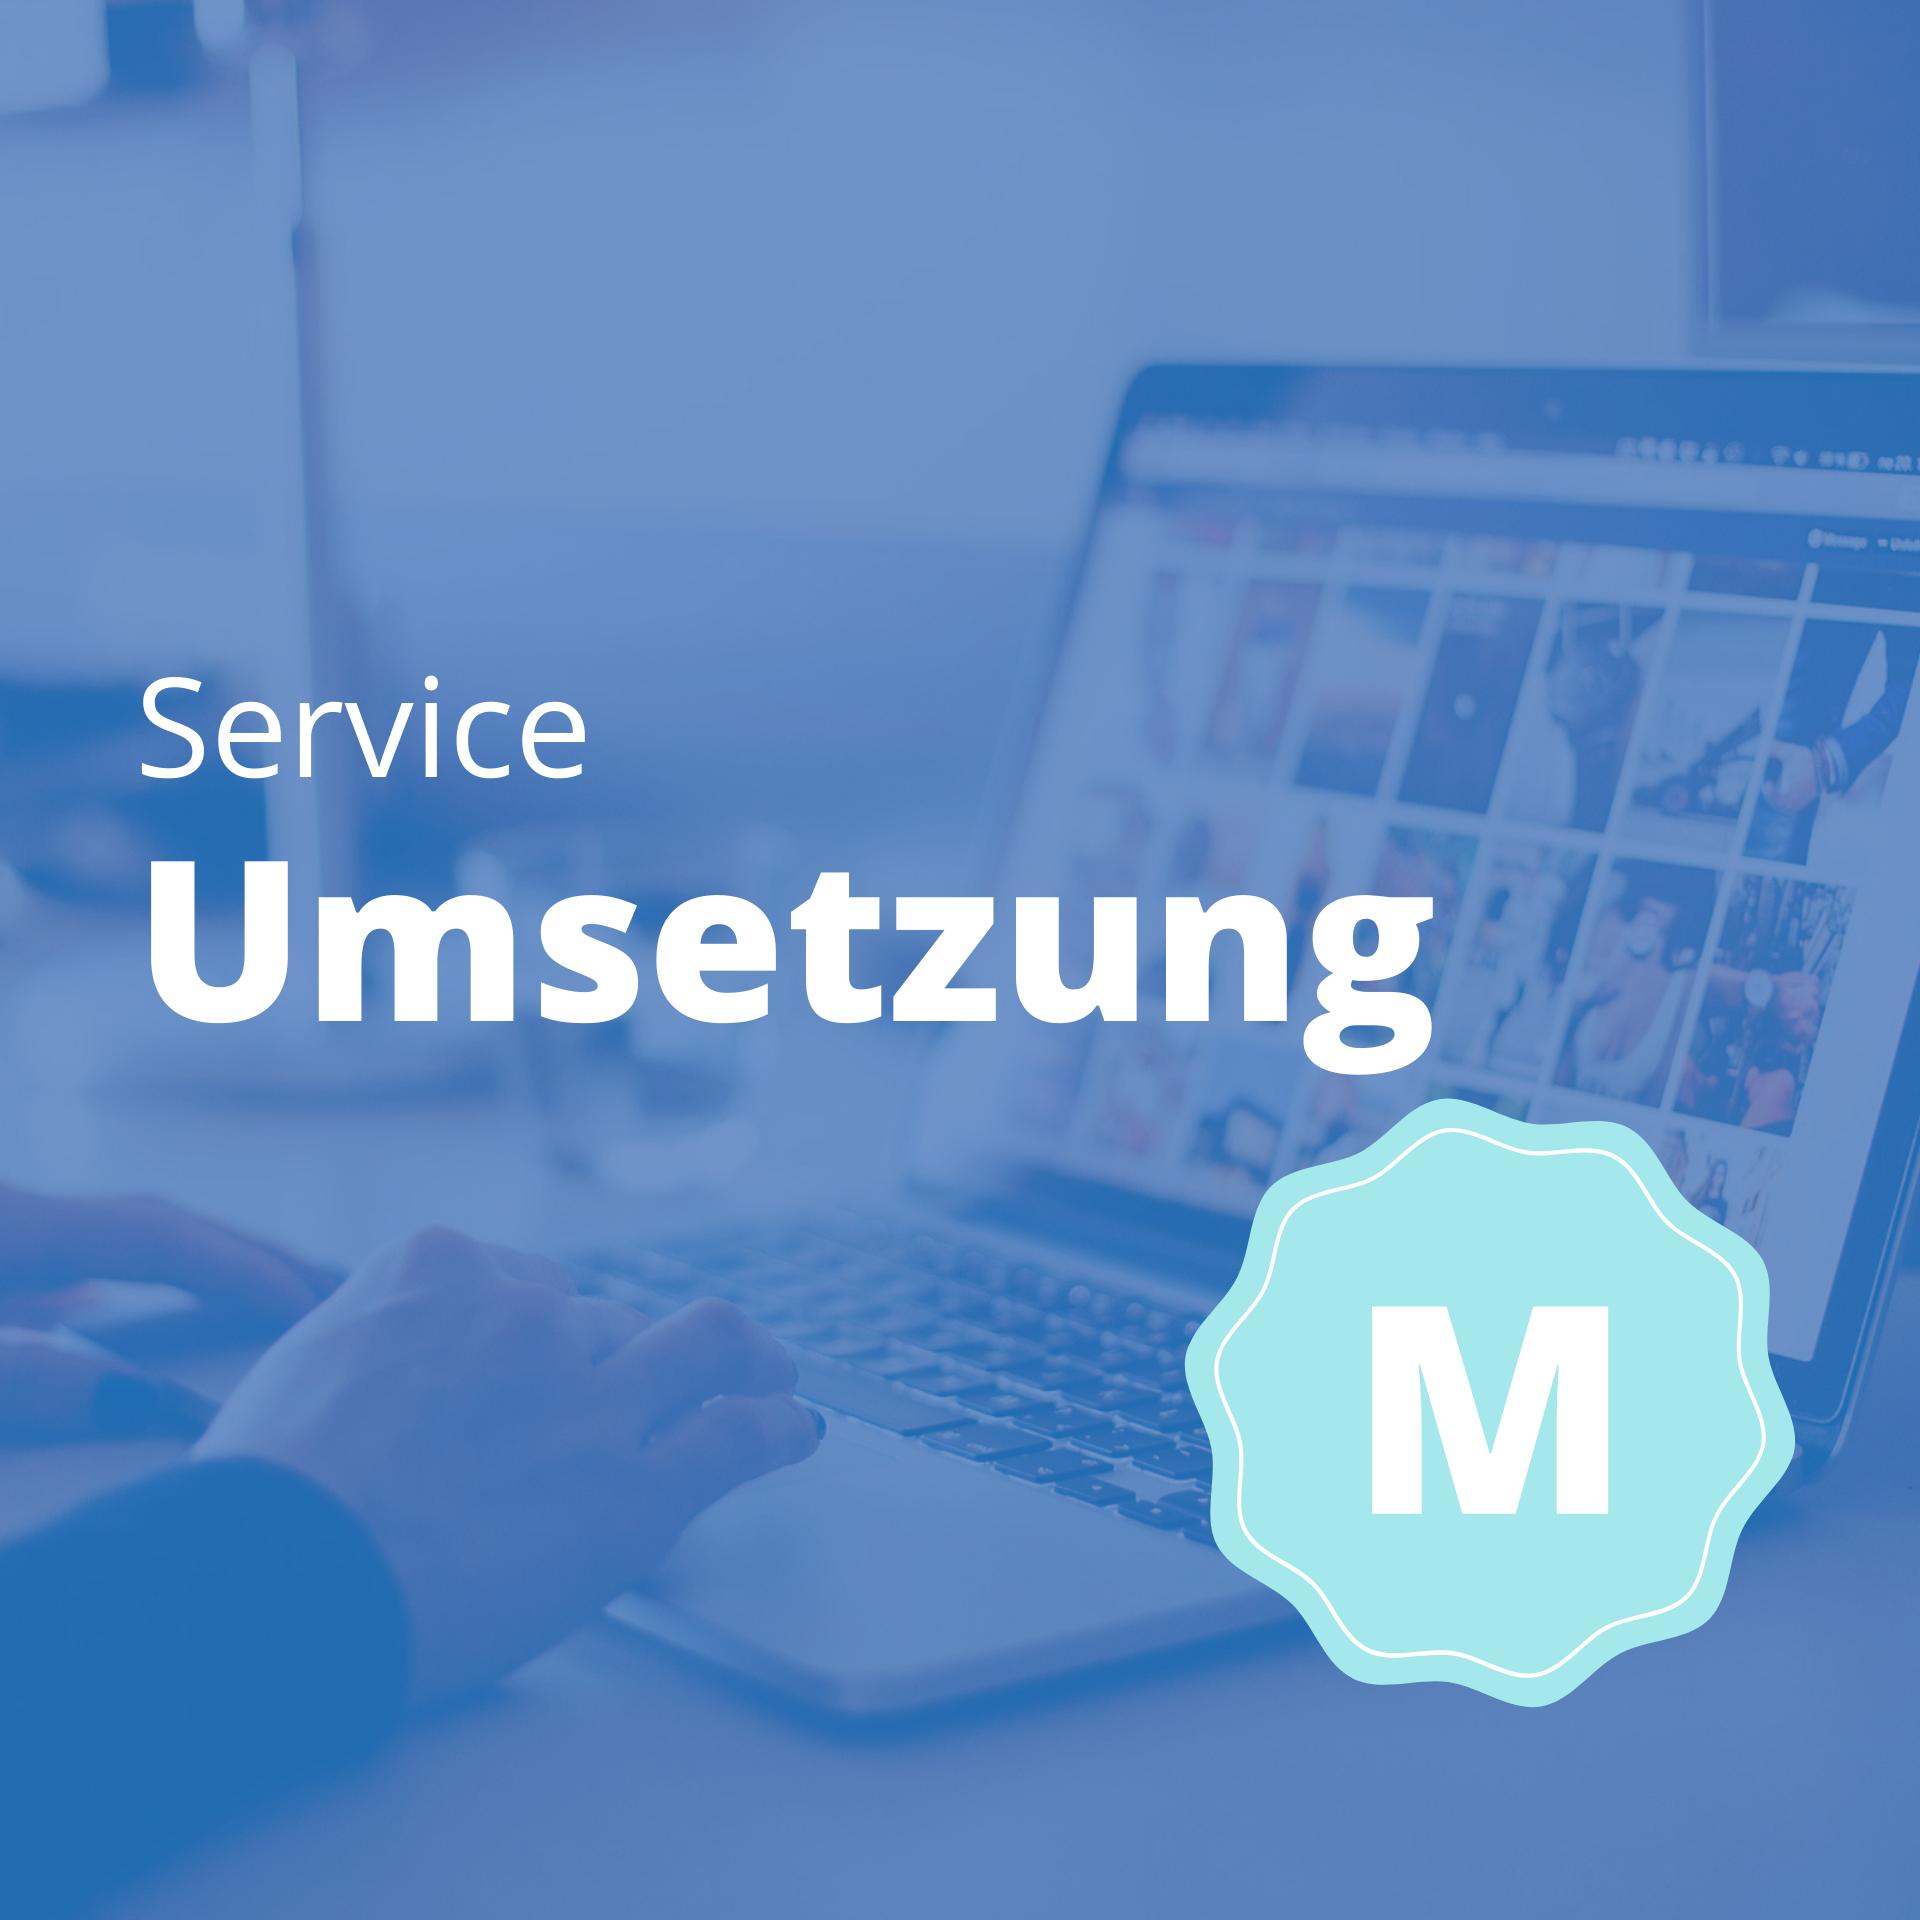 Service Umsetzung M